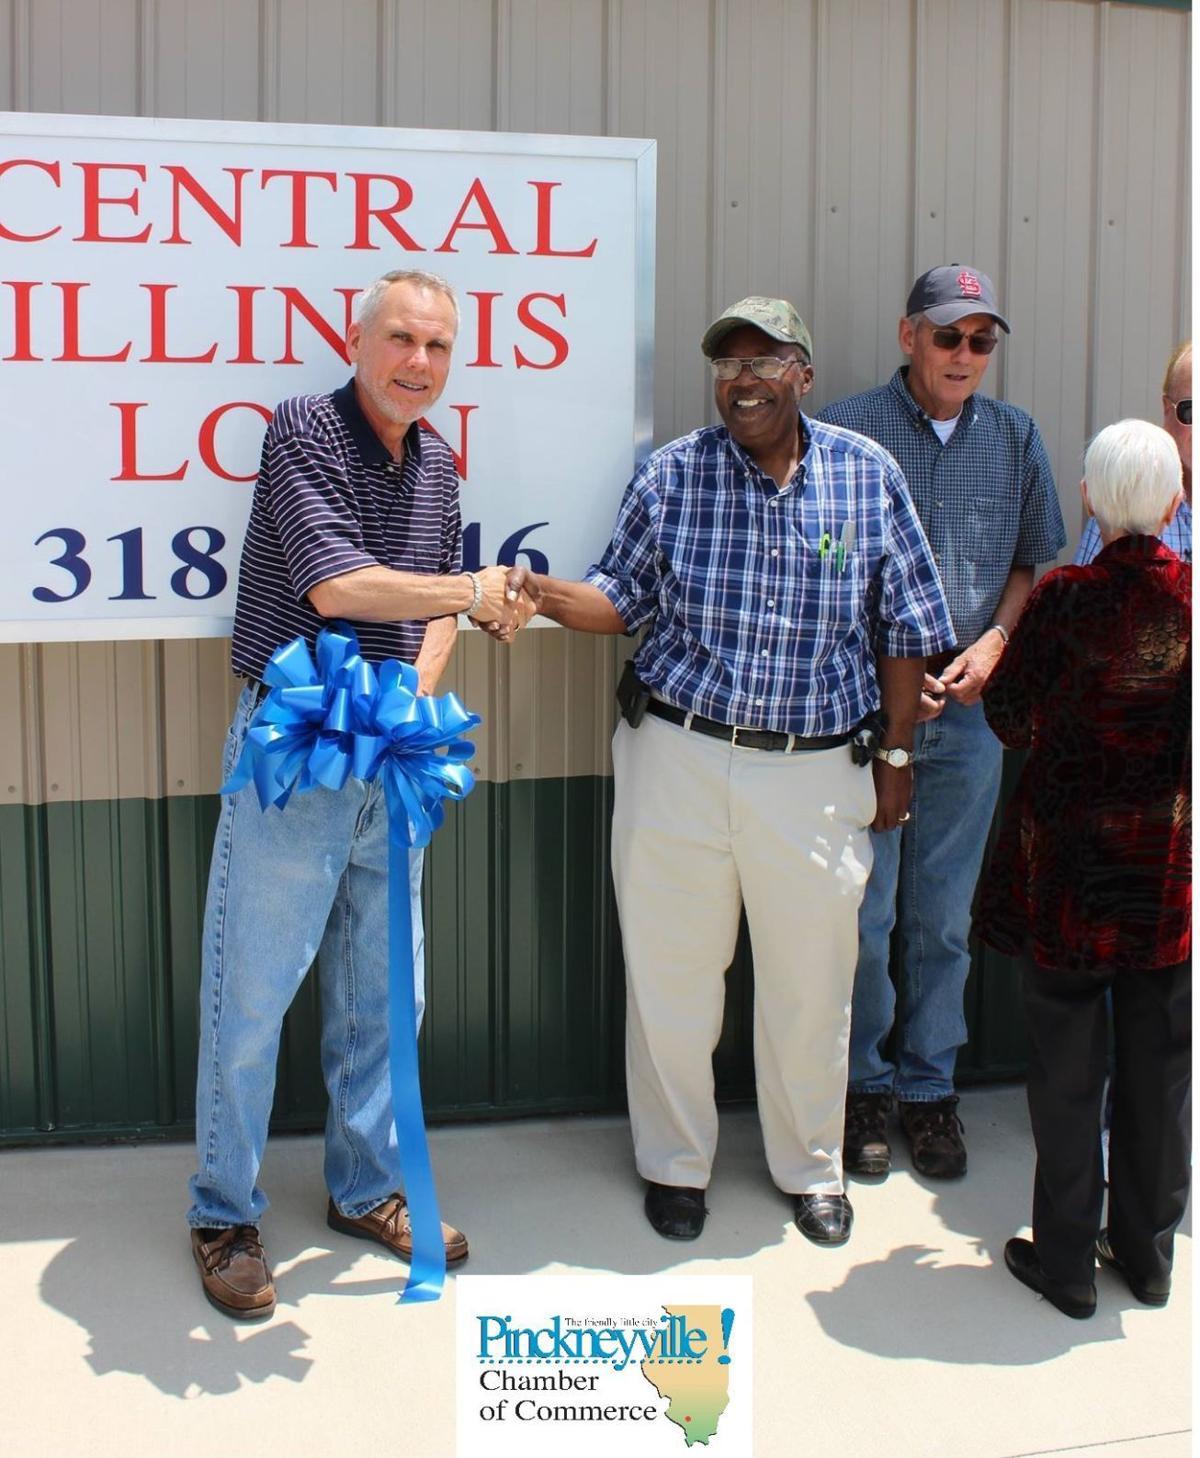 Central Illinois Loans opens branch in Pinckneyville